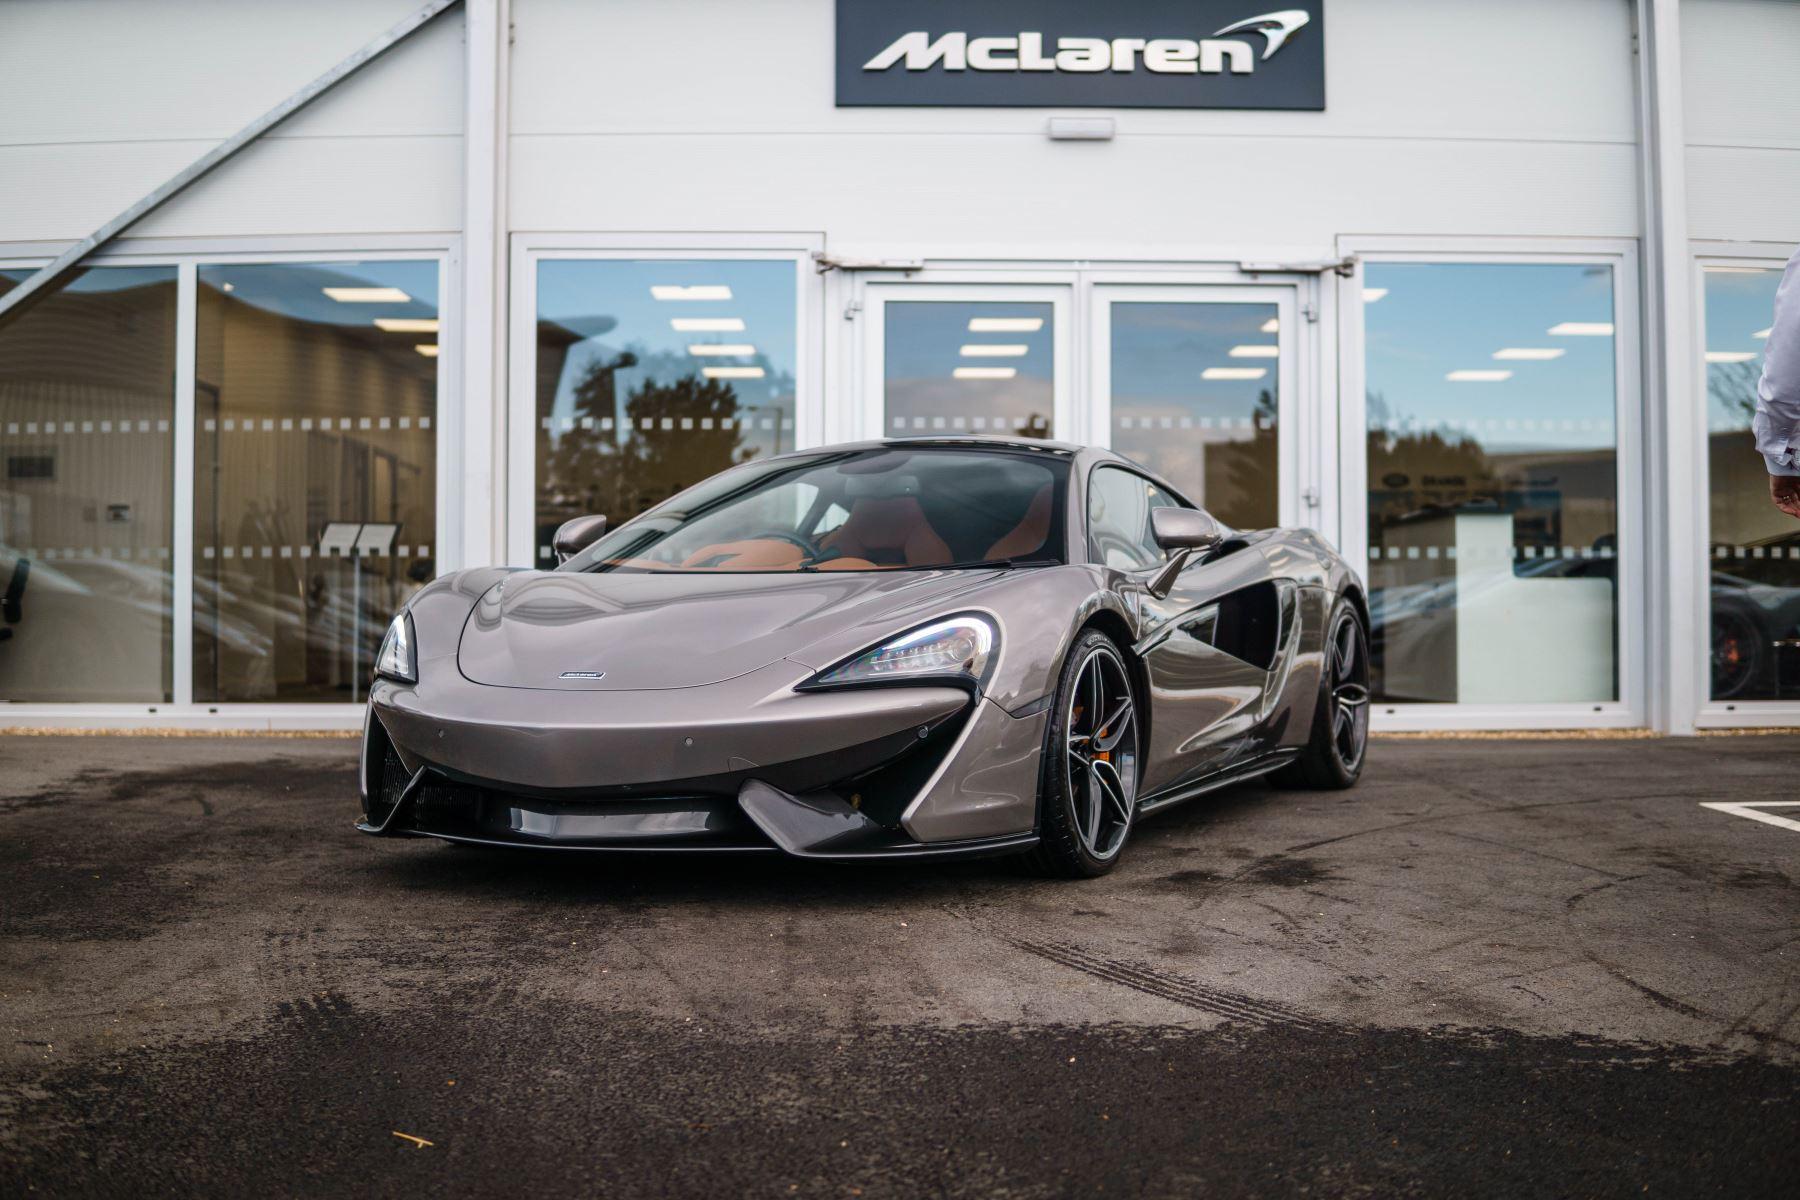 McLaren 570GT 3.8 COUPE Automatic 3 door Coupe (2017) image